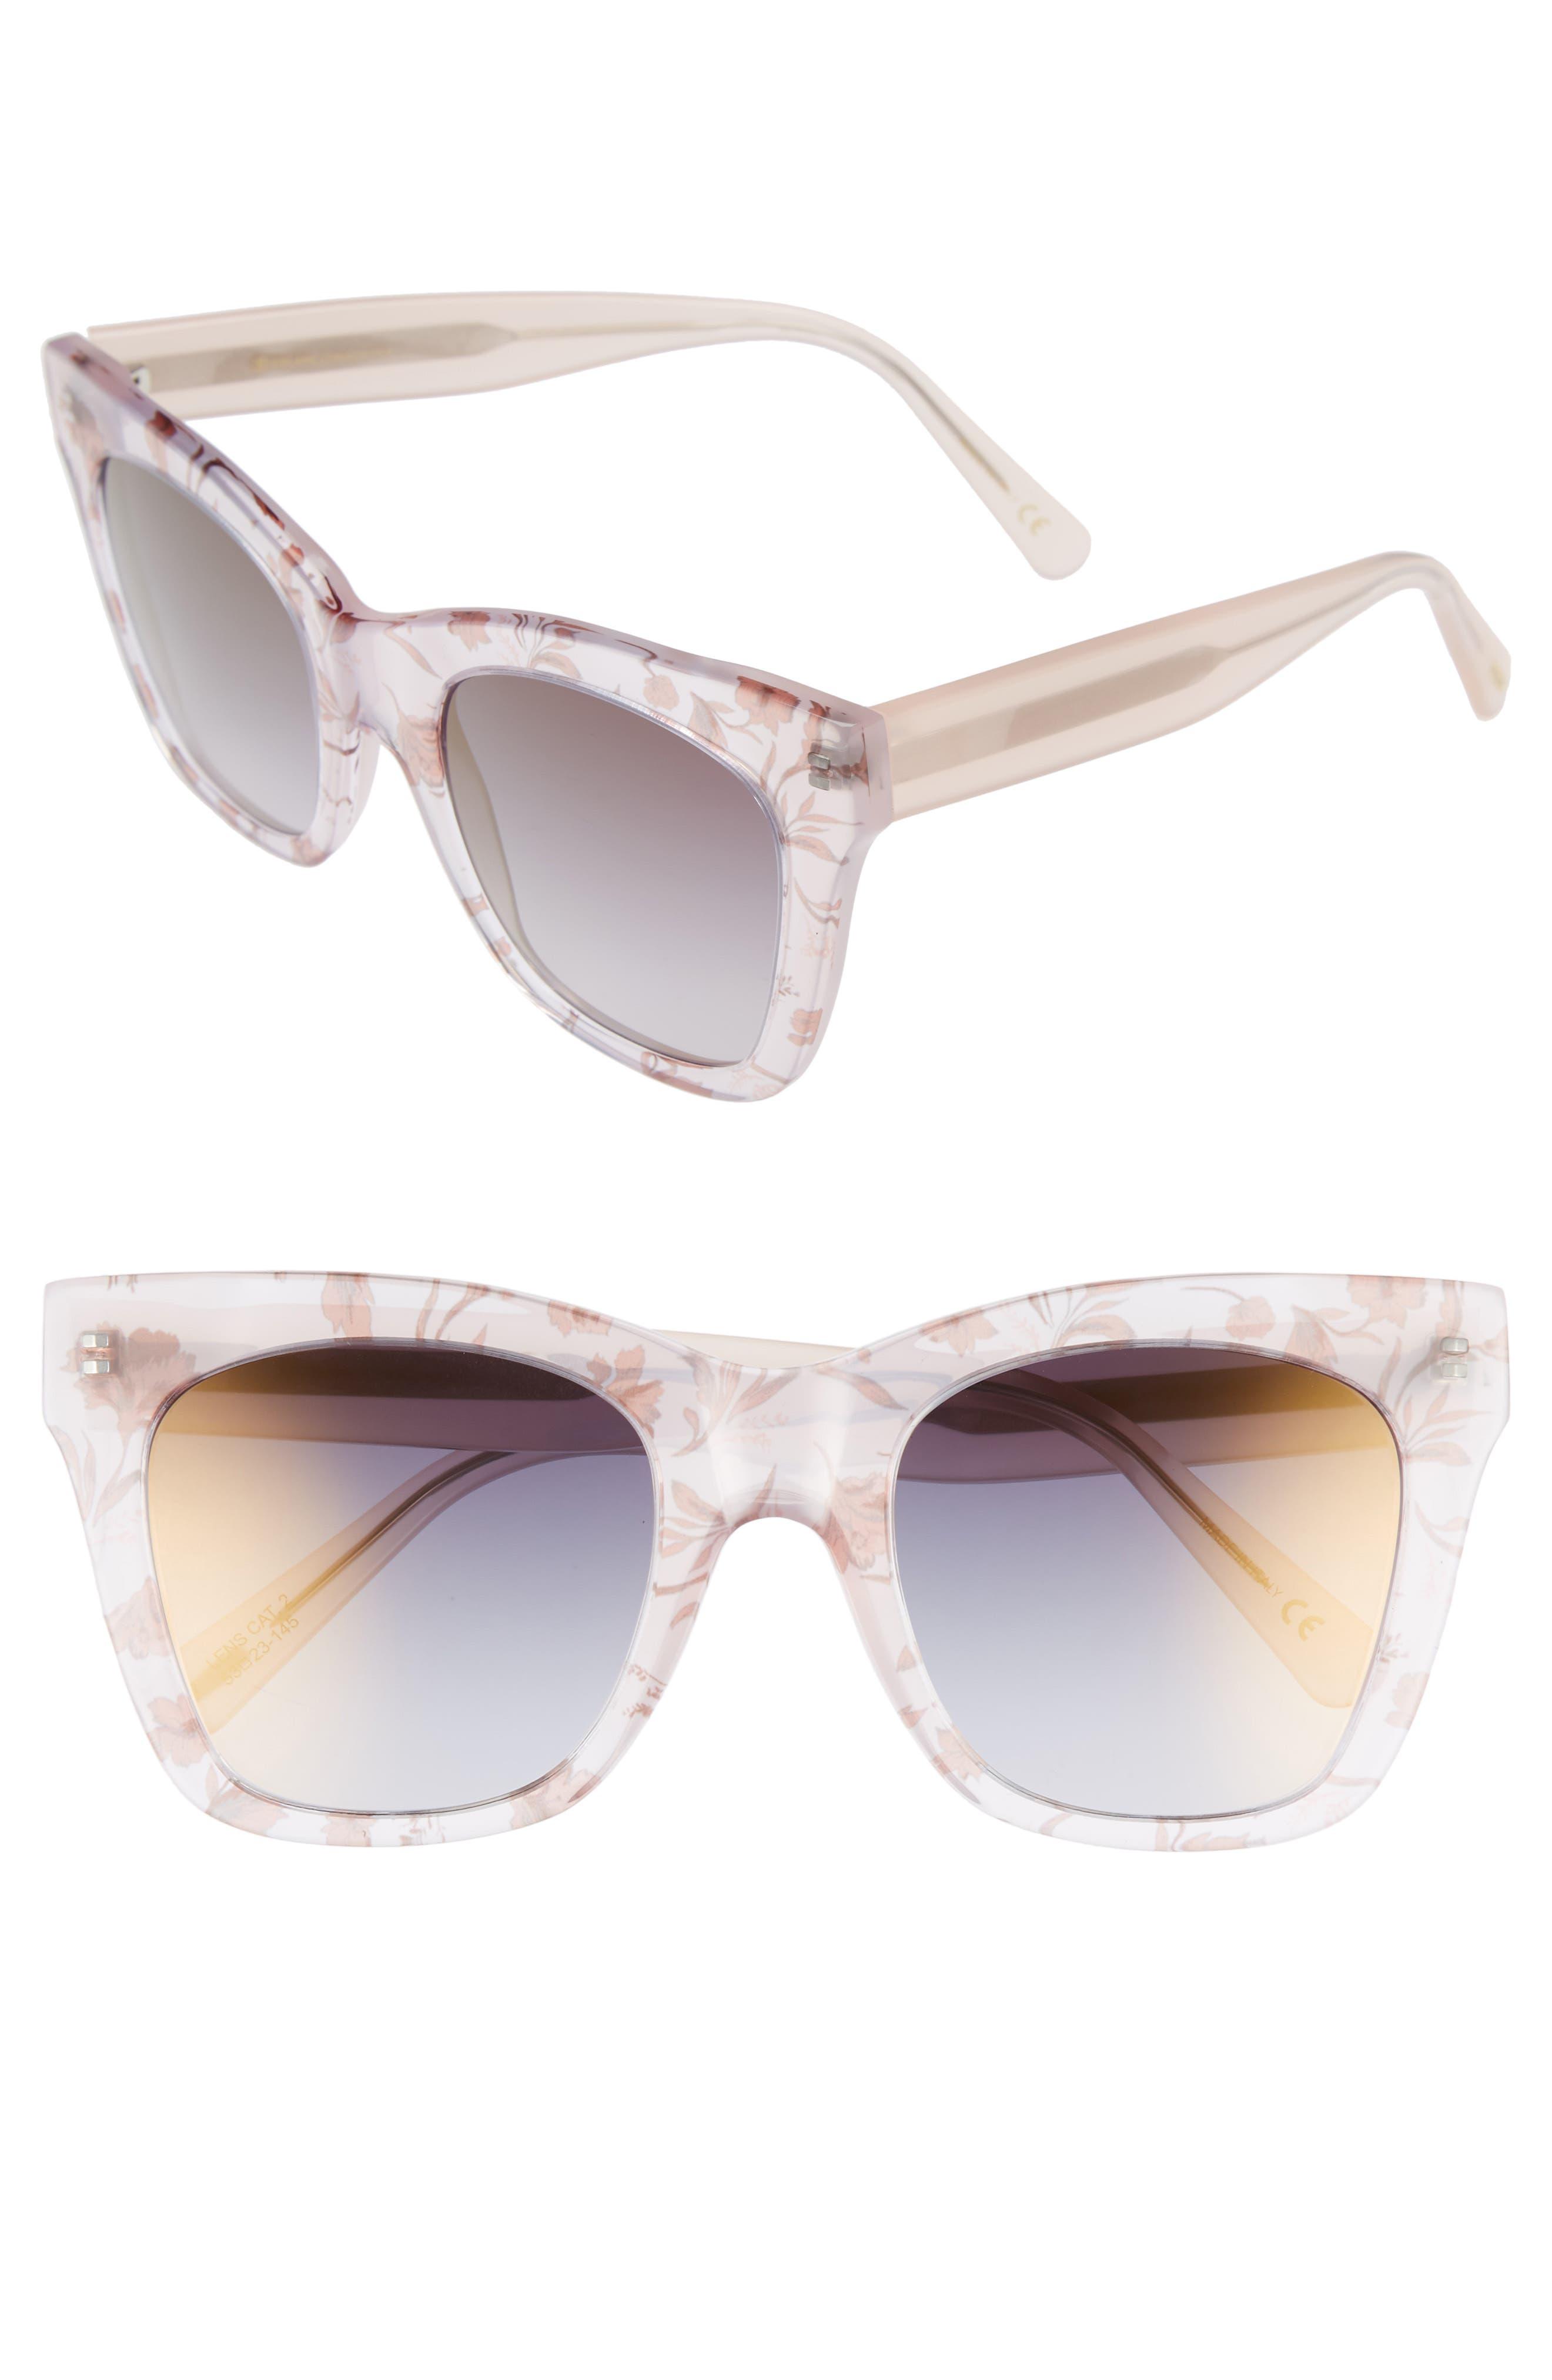 D'BLANC Beach Vida 52mm Sunglasses,                         Main,                         color, Something Nice